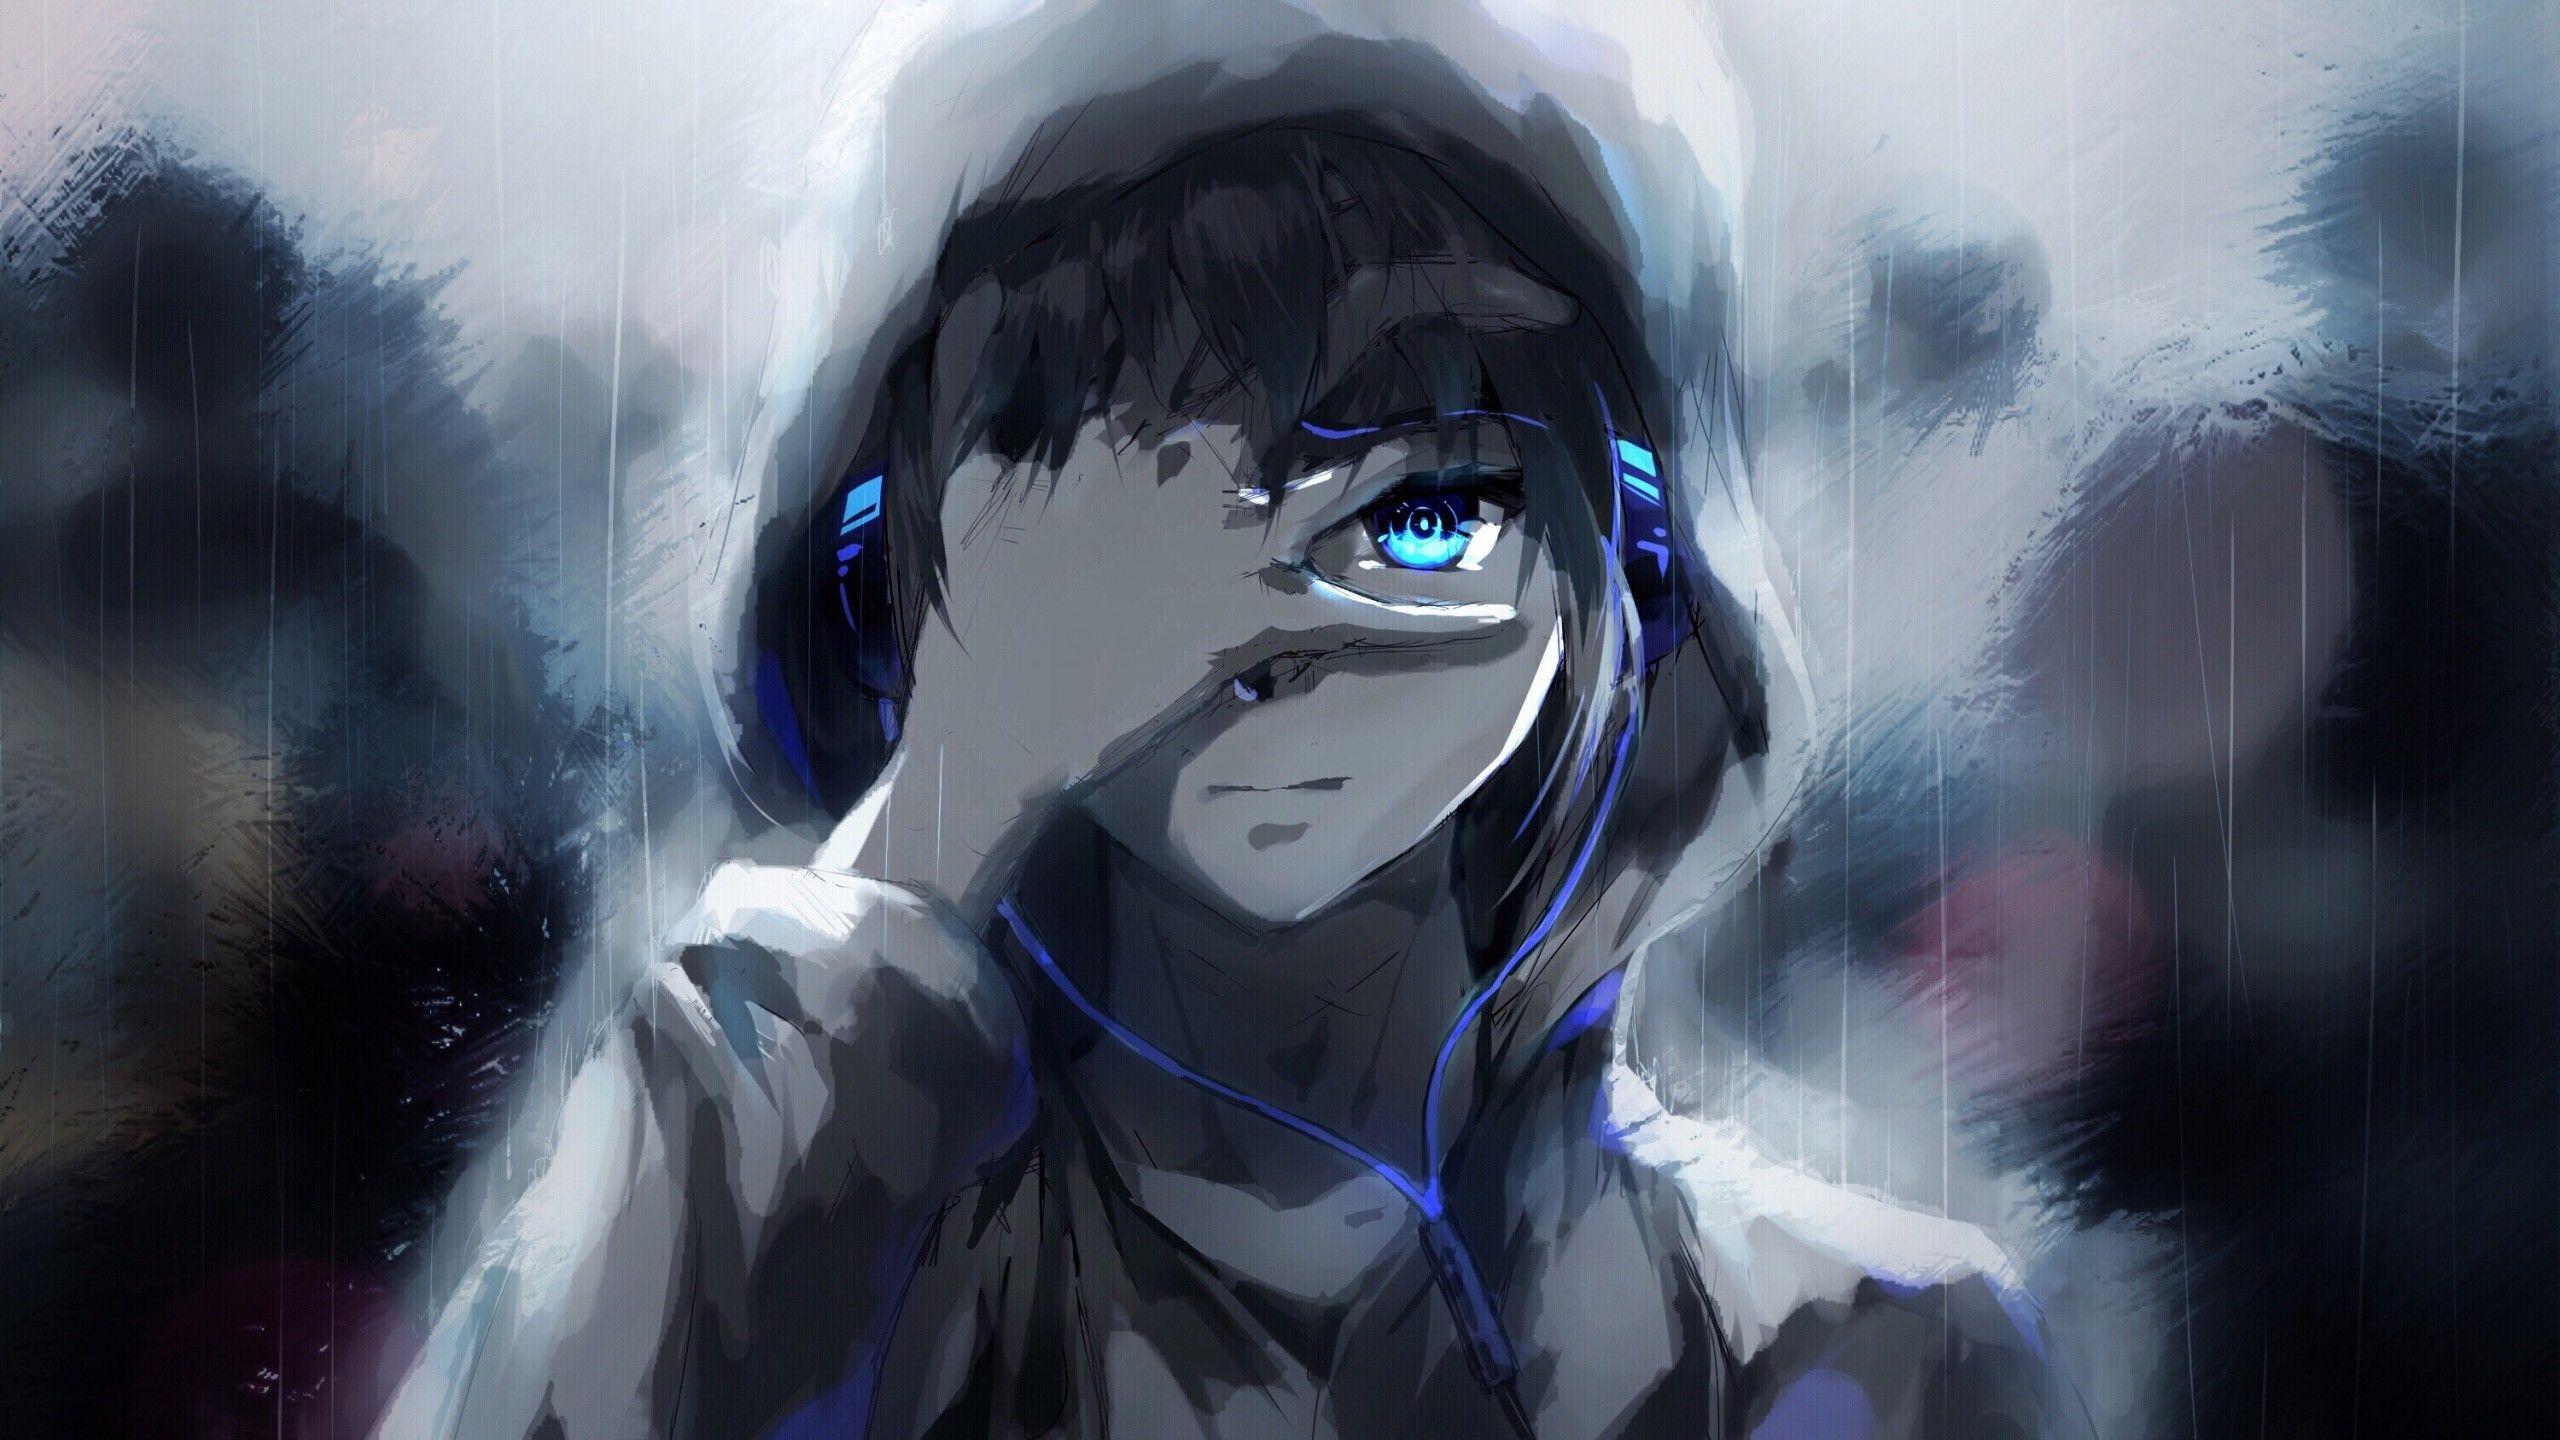 2560x1440 anime boyhoodieblue eyesheadphonespainting wallpapers for imac 27 inch wallpapermaiden